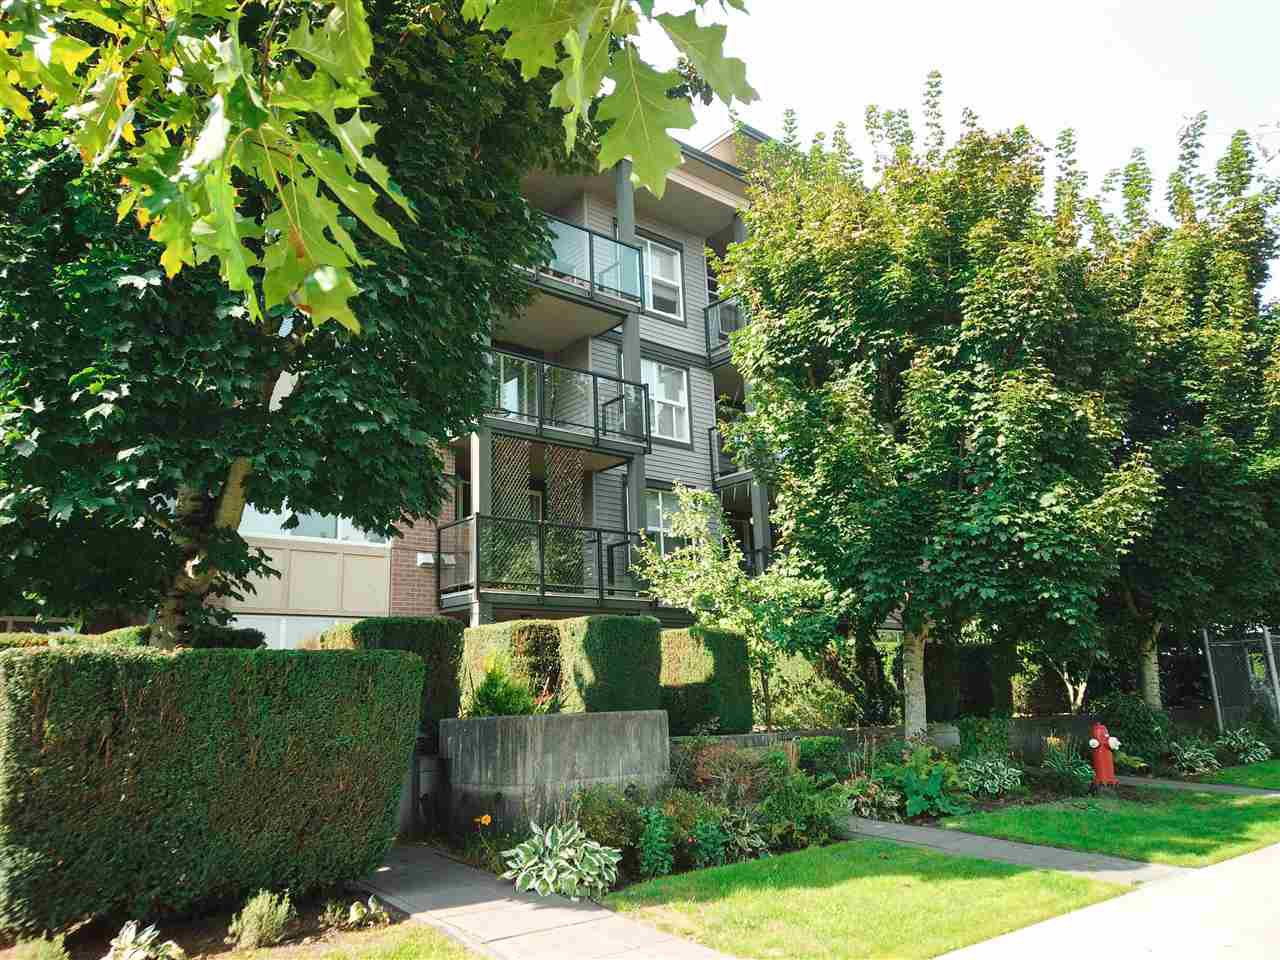 Main Photo: 123 10707 139 Street in Surrey: Whalley Condo for sale (North Surrey)  : MLS®# R2504600